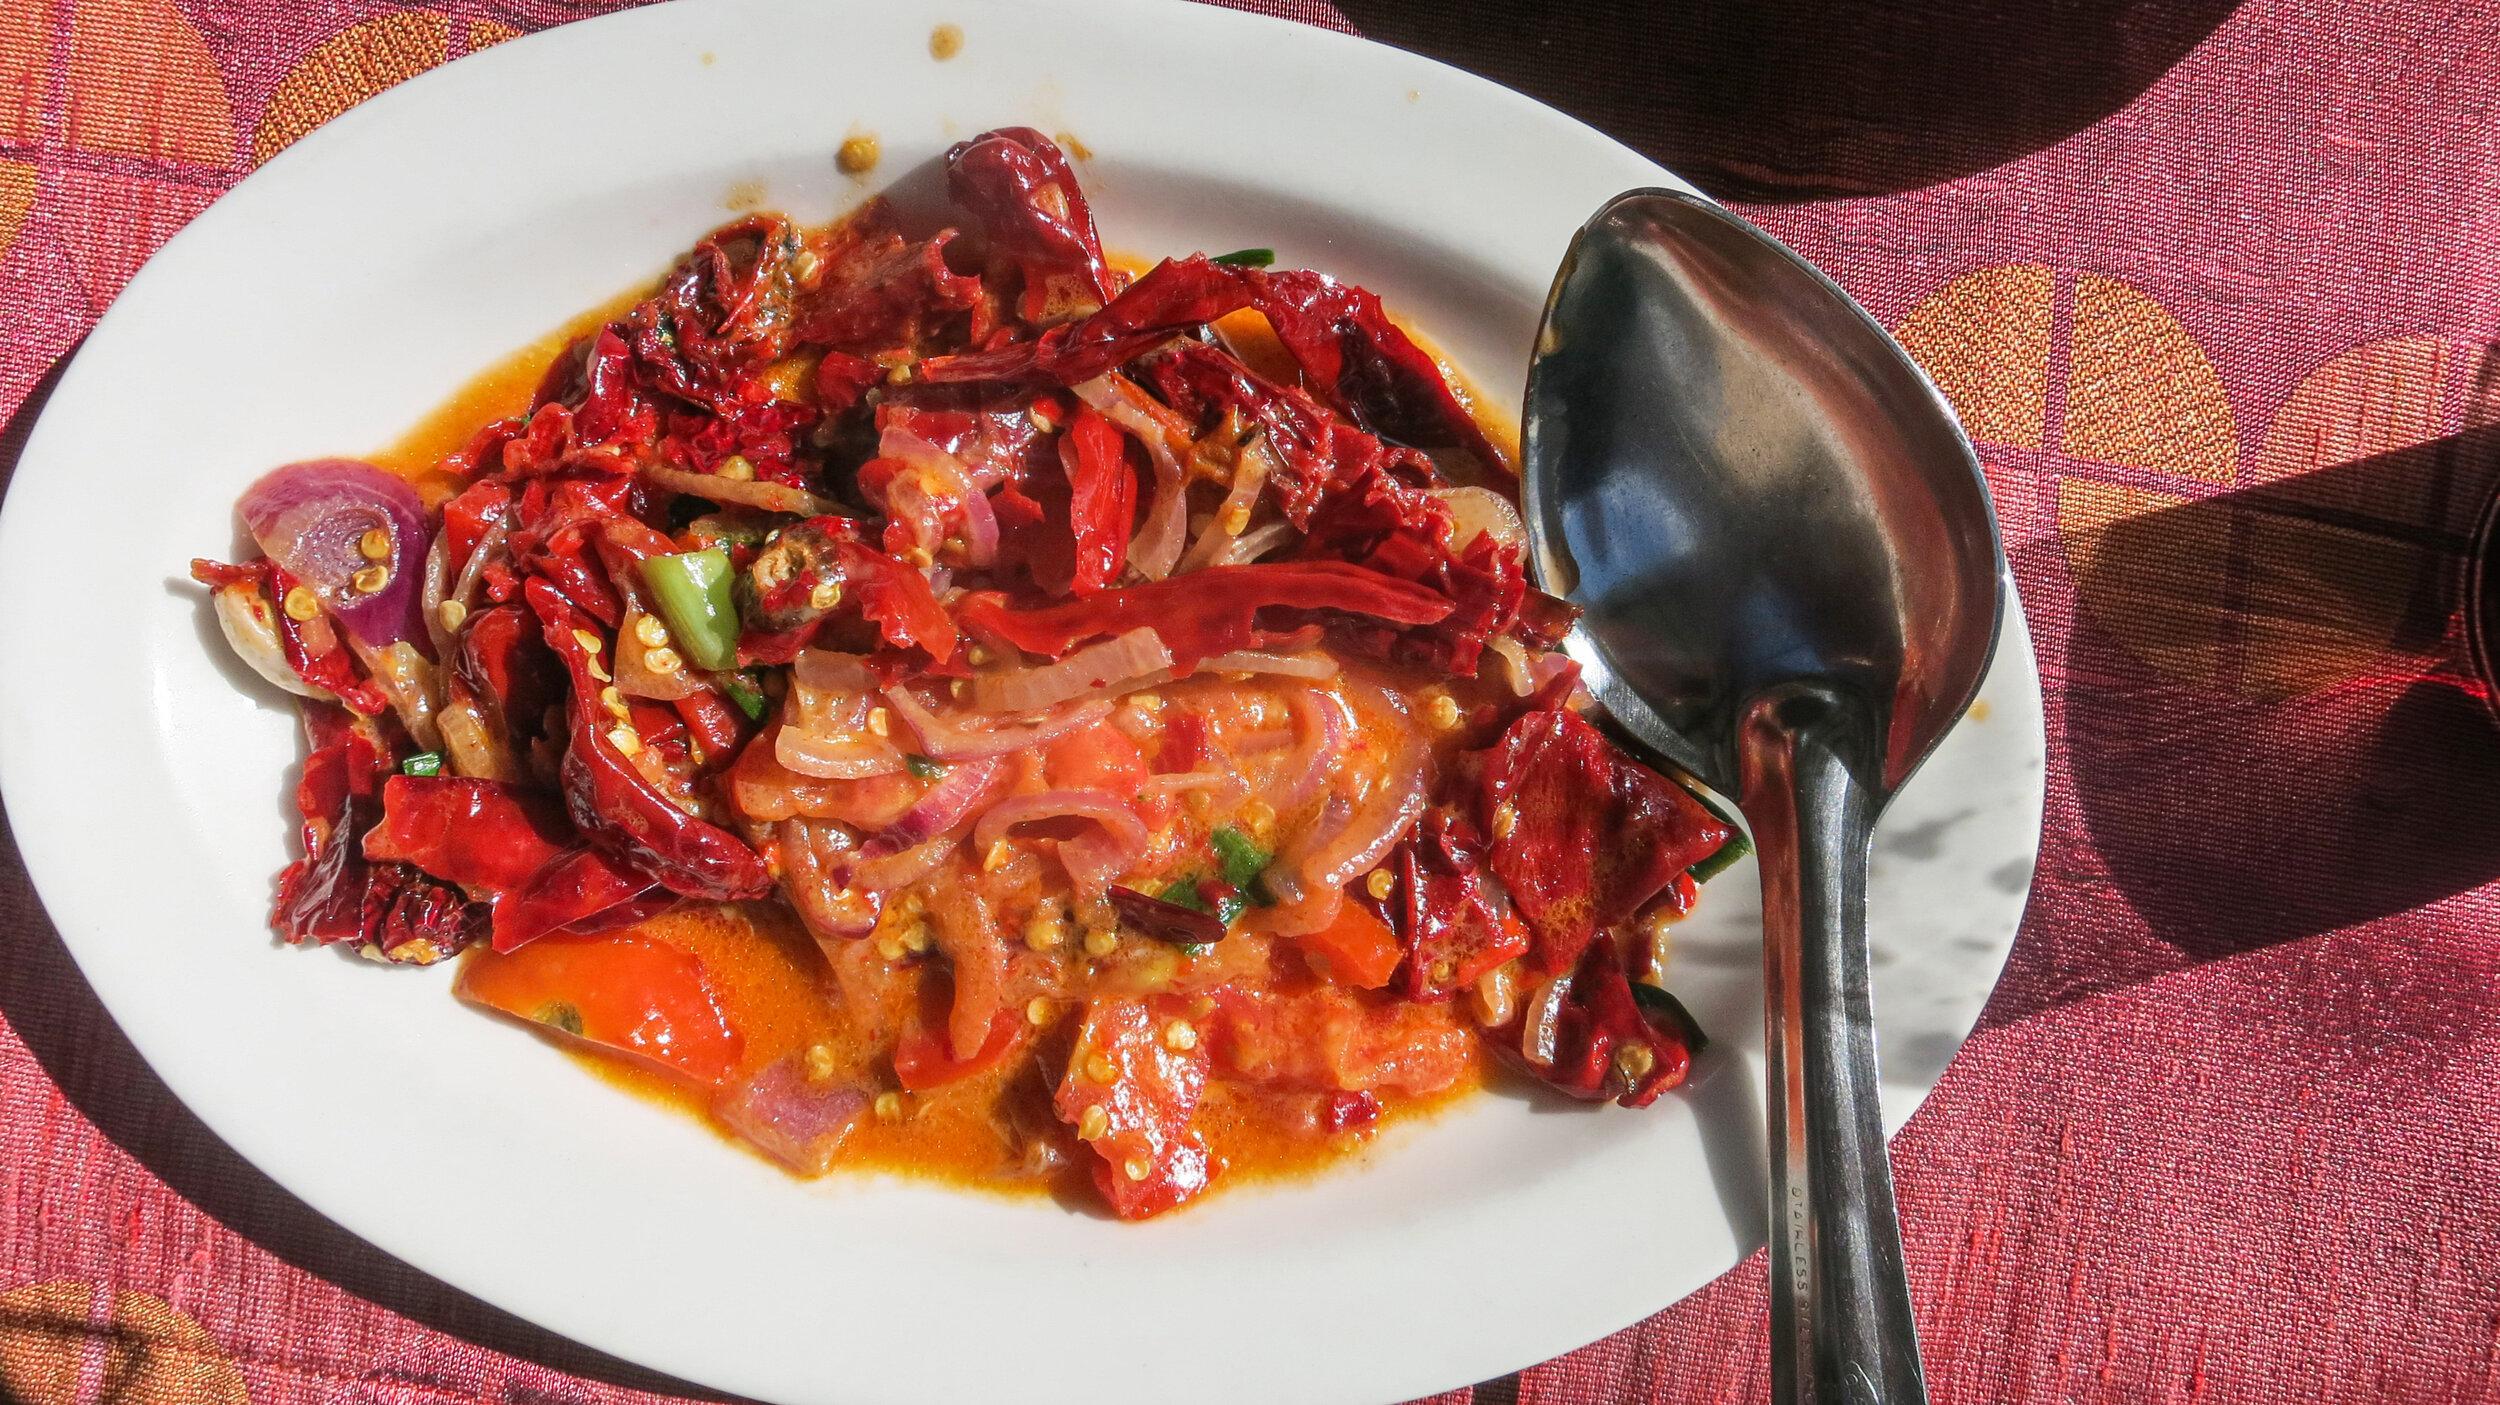 The Bhutan National Dish, Ema Datshi